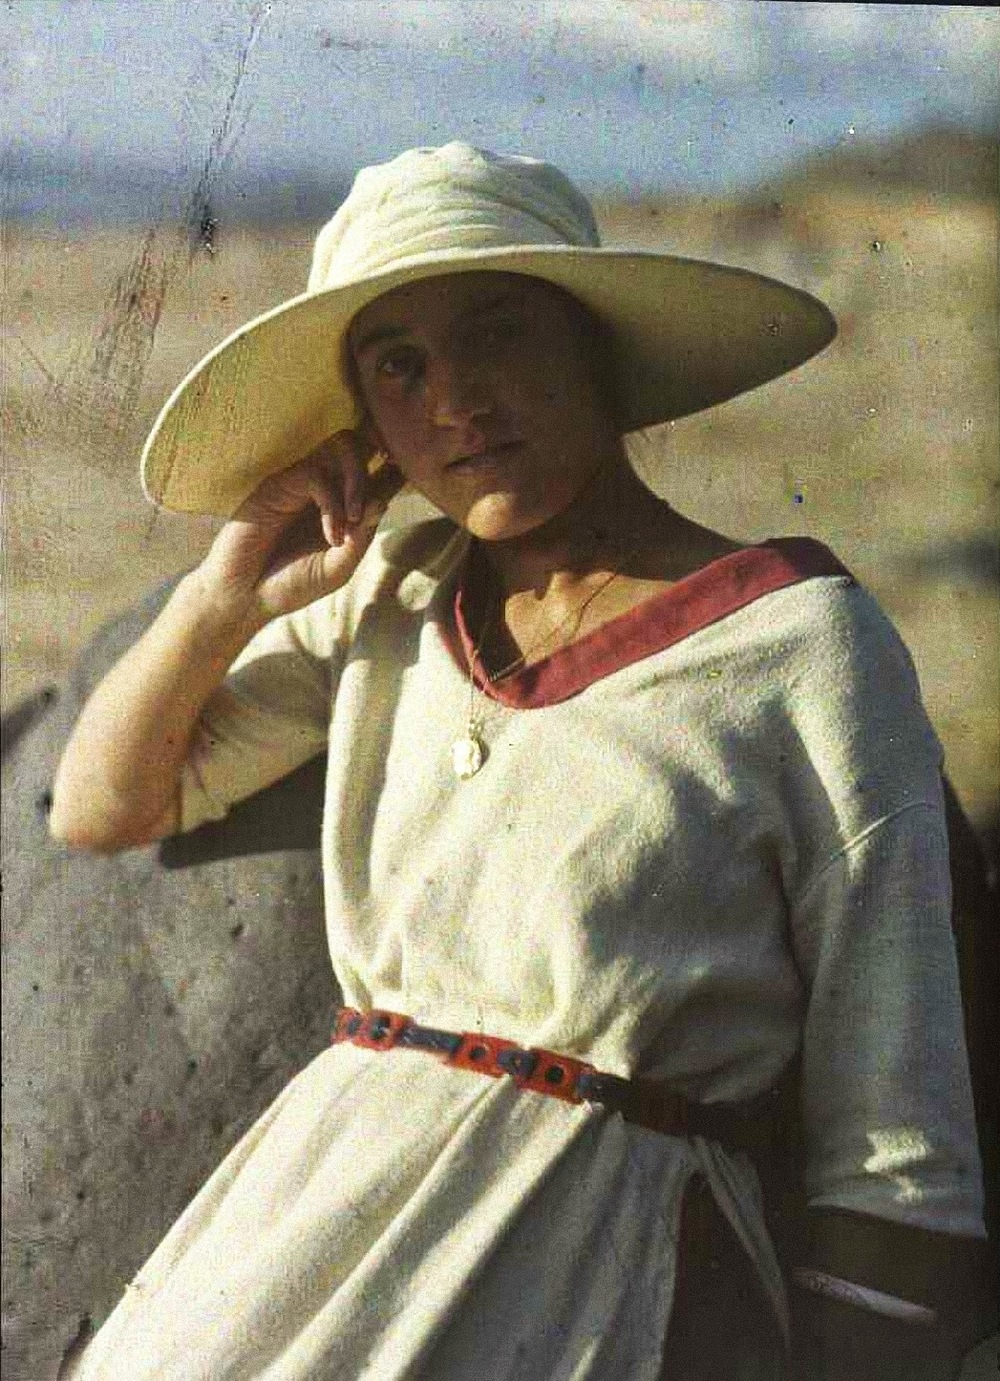 1920s_autochrome_photo_10.jpg